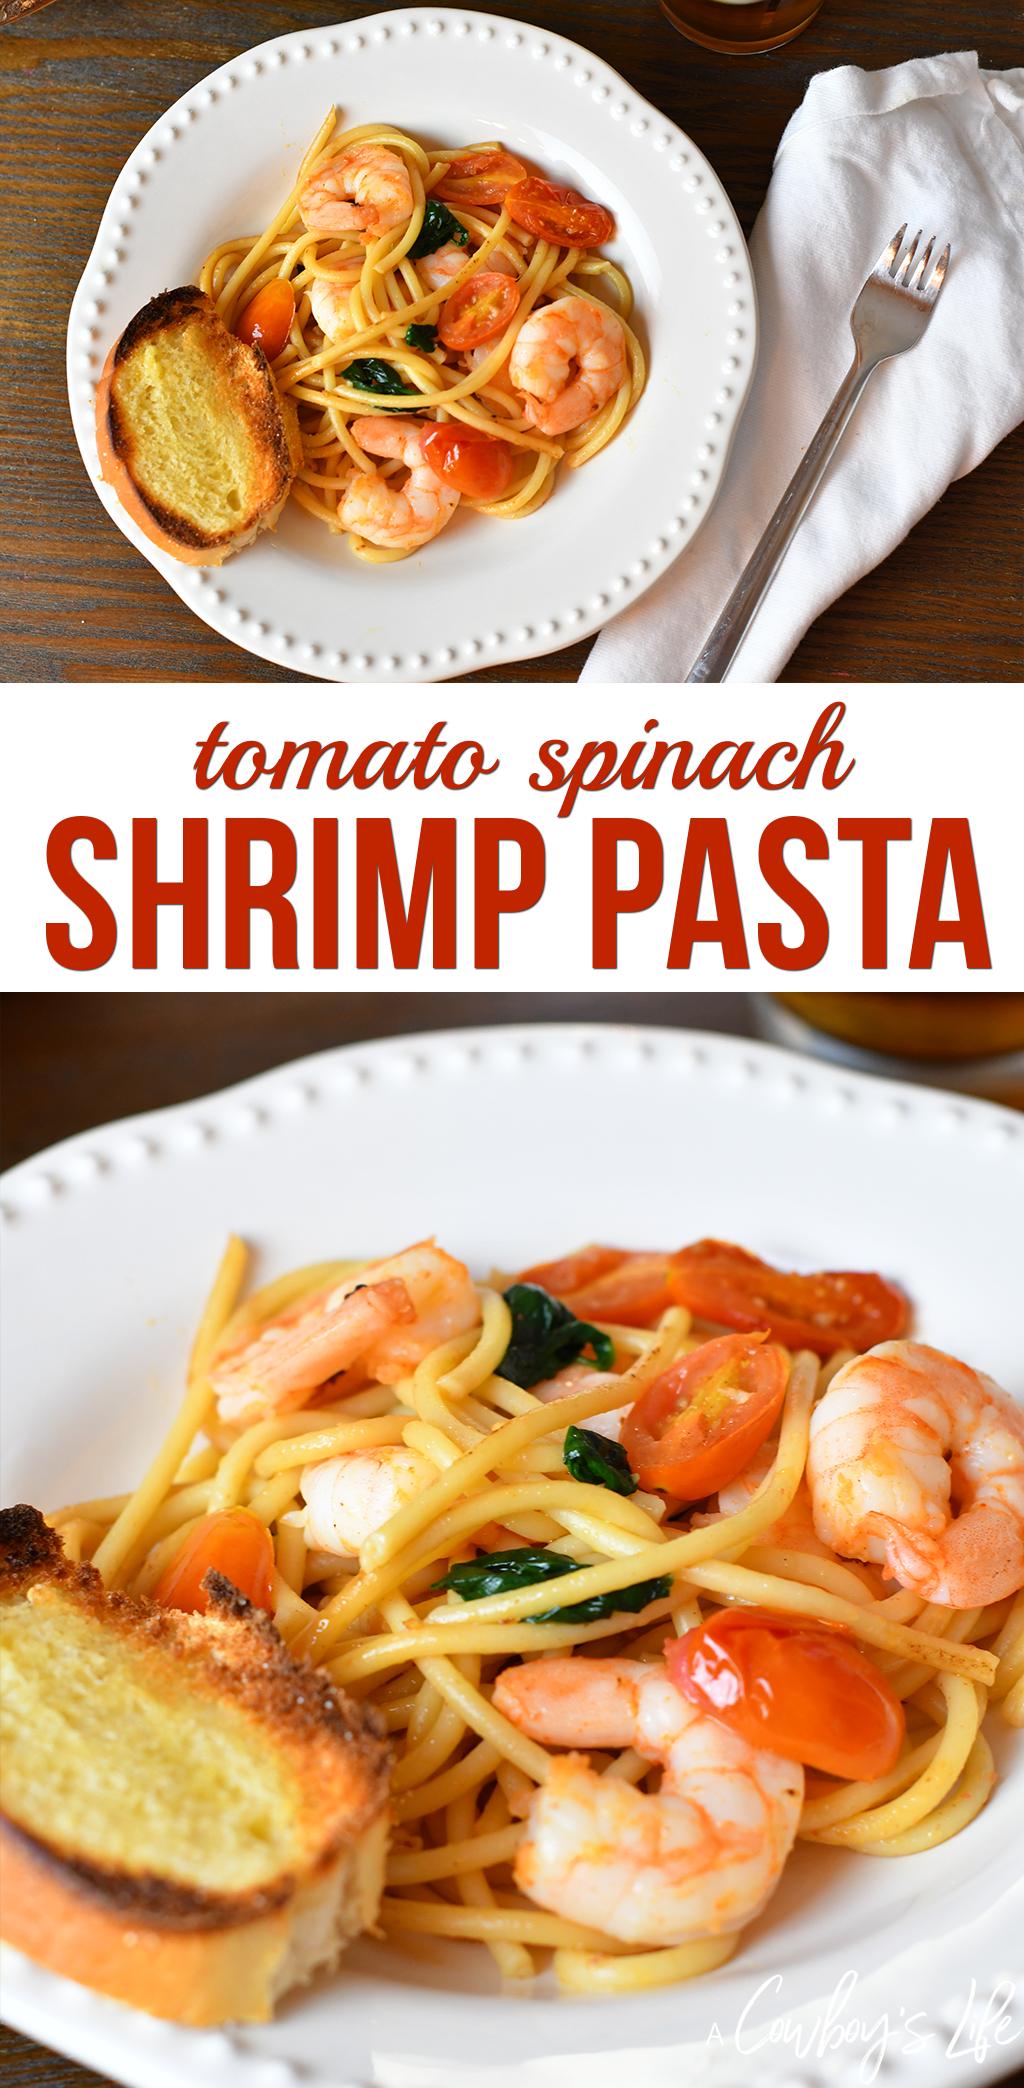 tomato spinach shrimp pasta